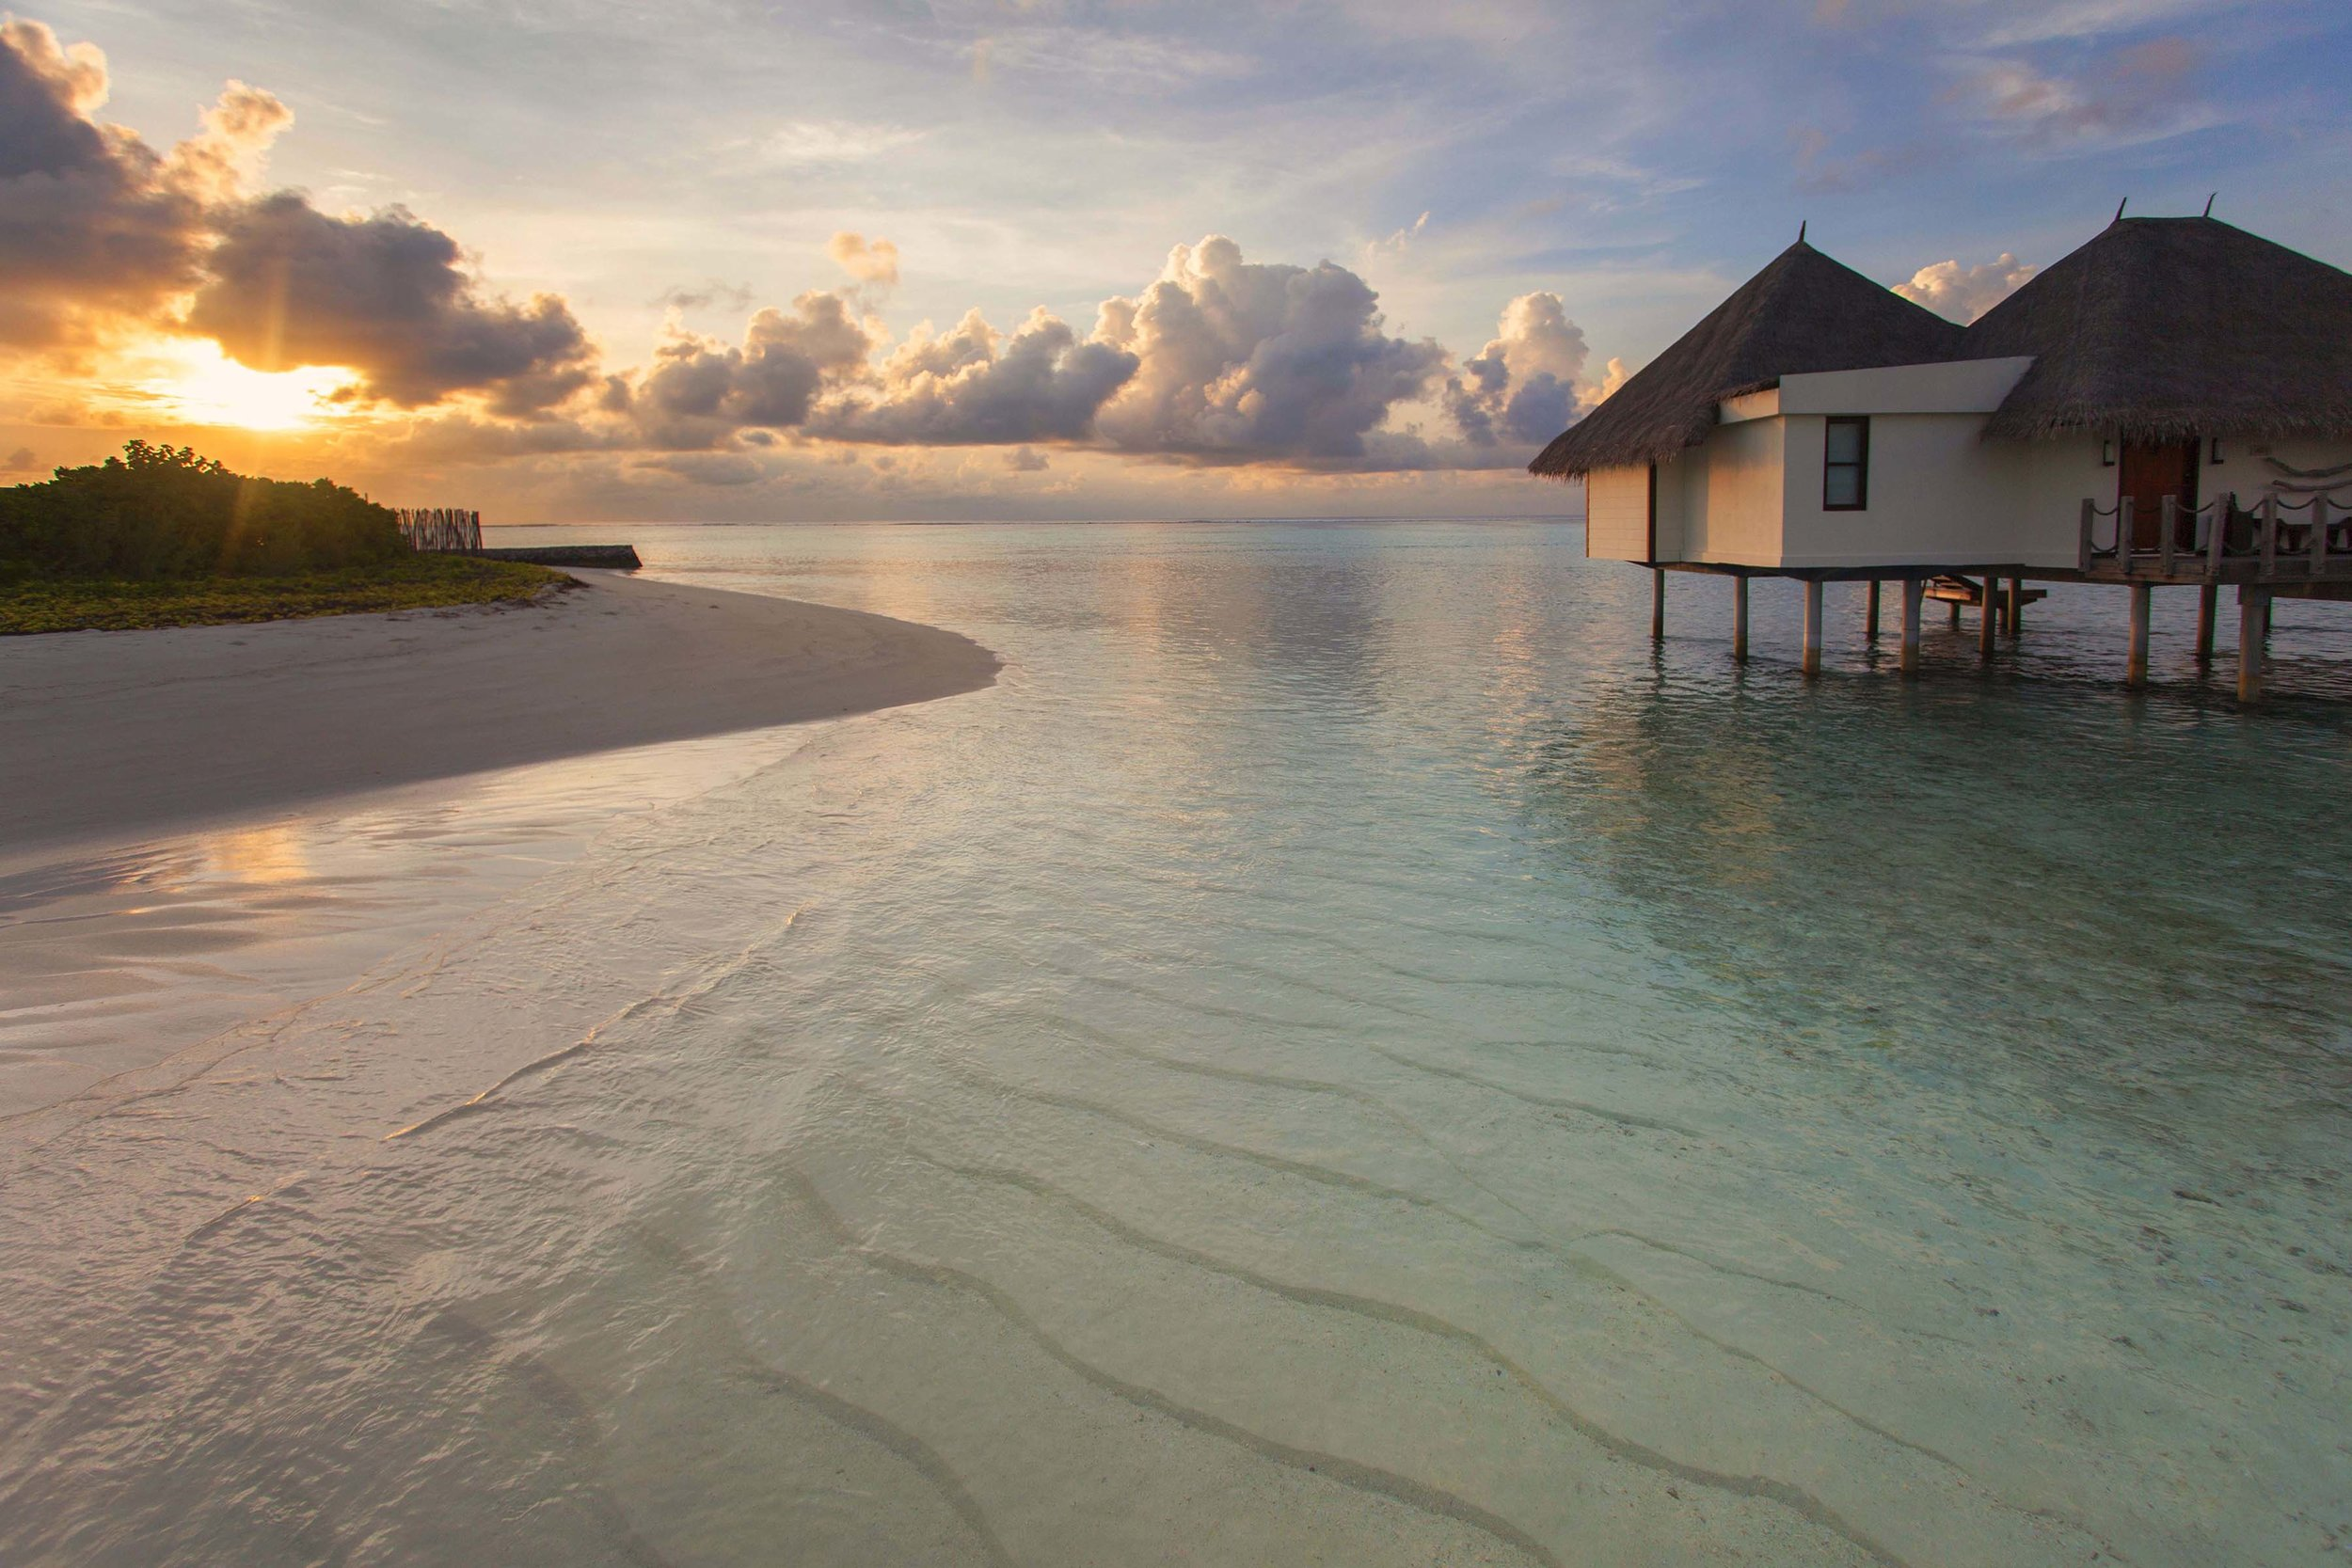 Maldives_Apr182010_1793 (2) Raw edit copy.jpg